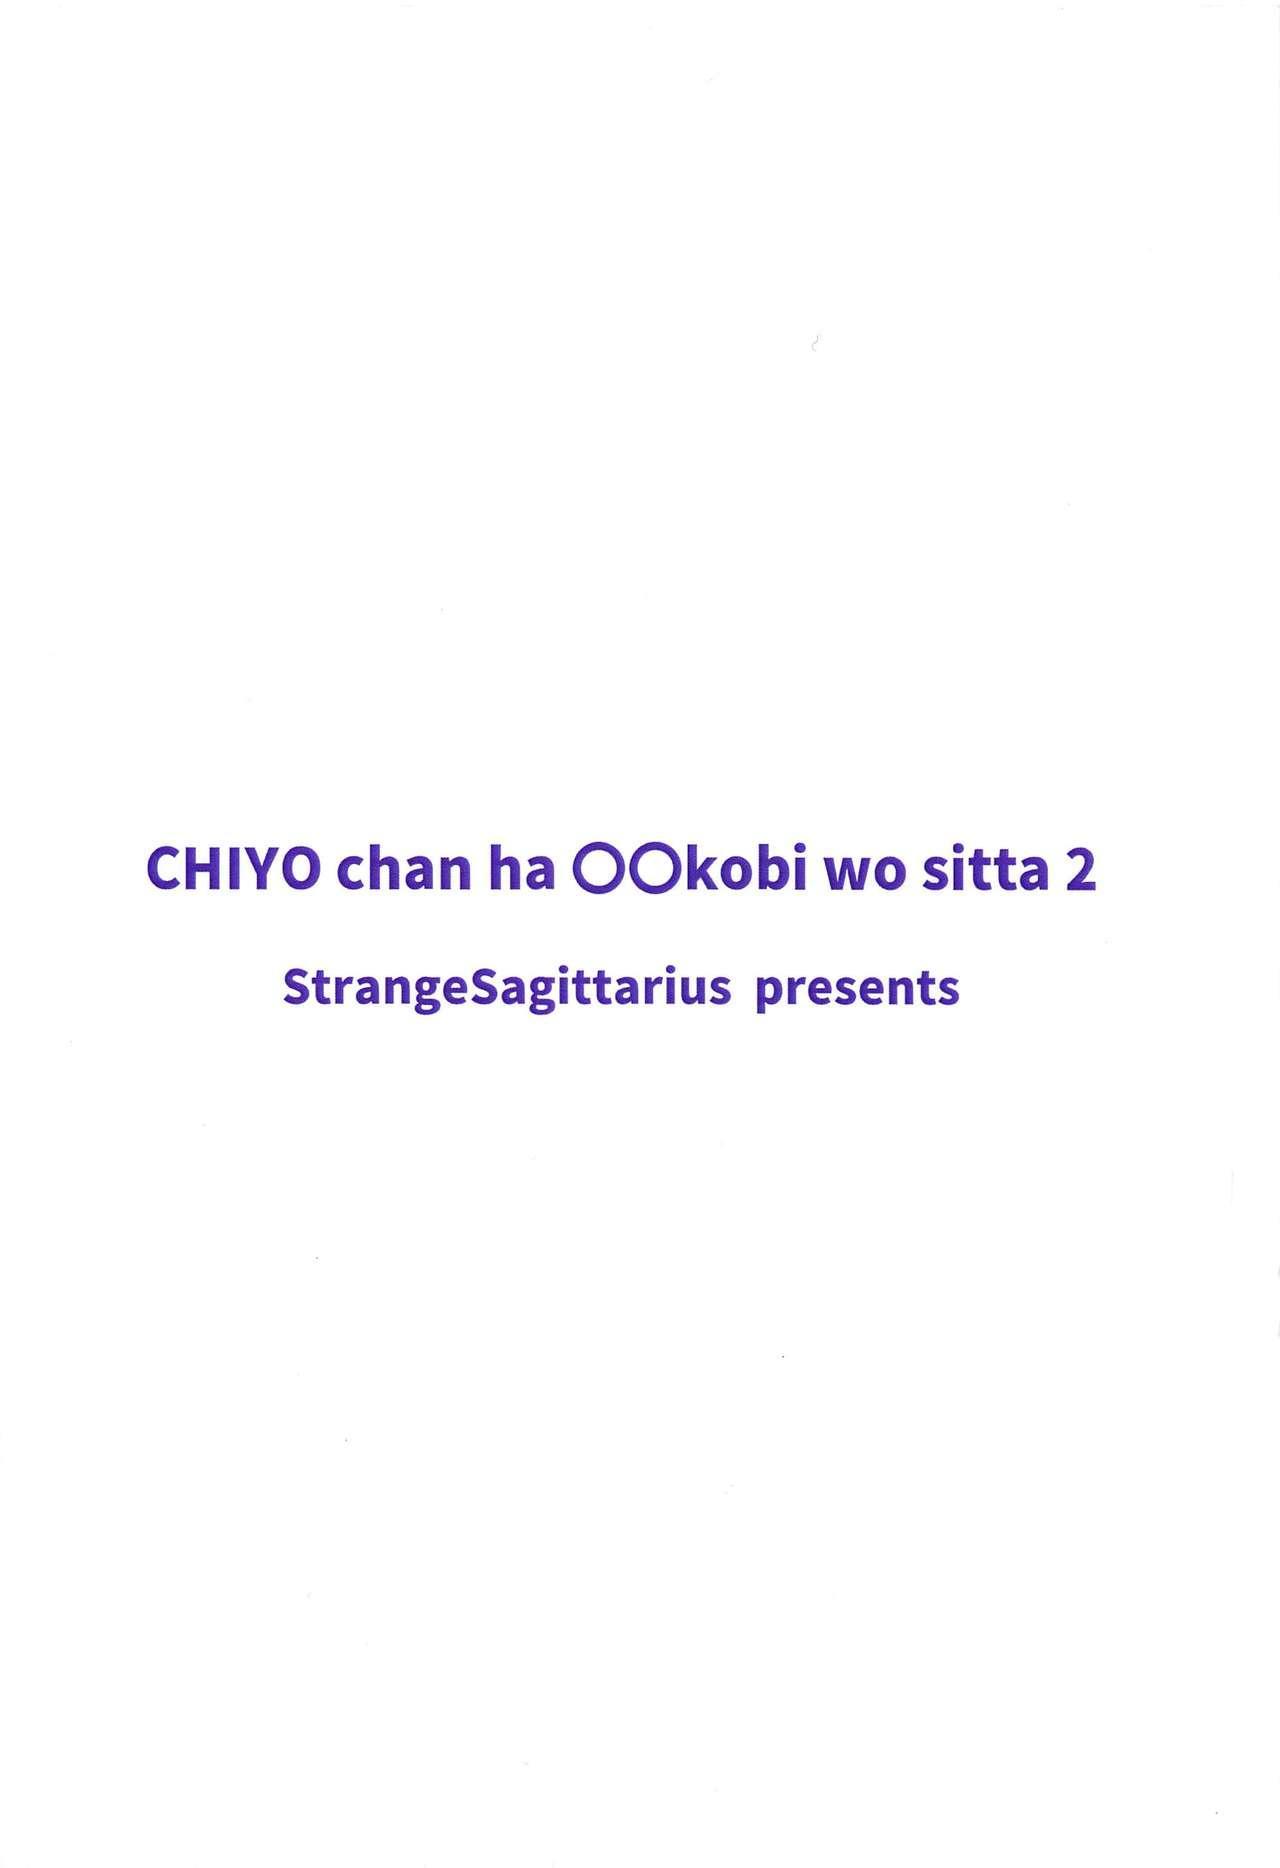 CHIYOchan ha 〇〇kobi wo sitta 2 25